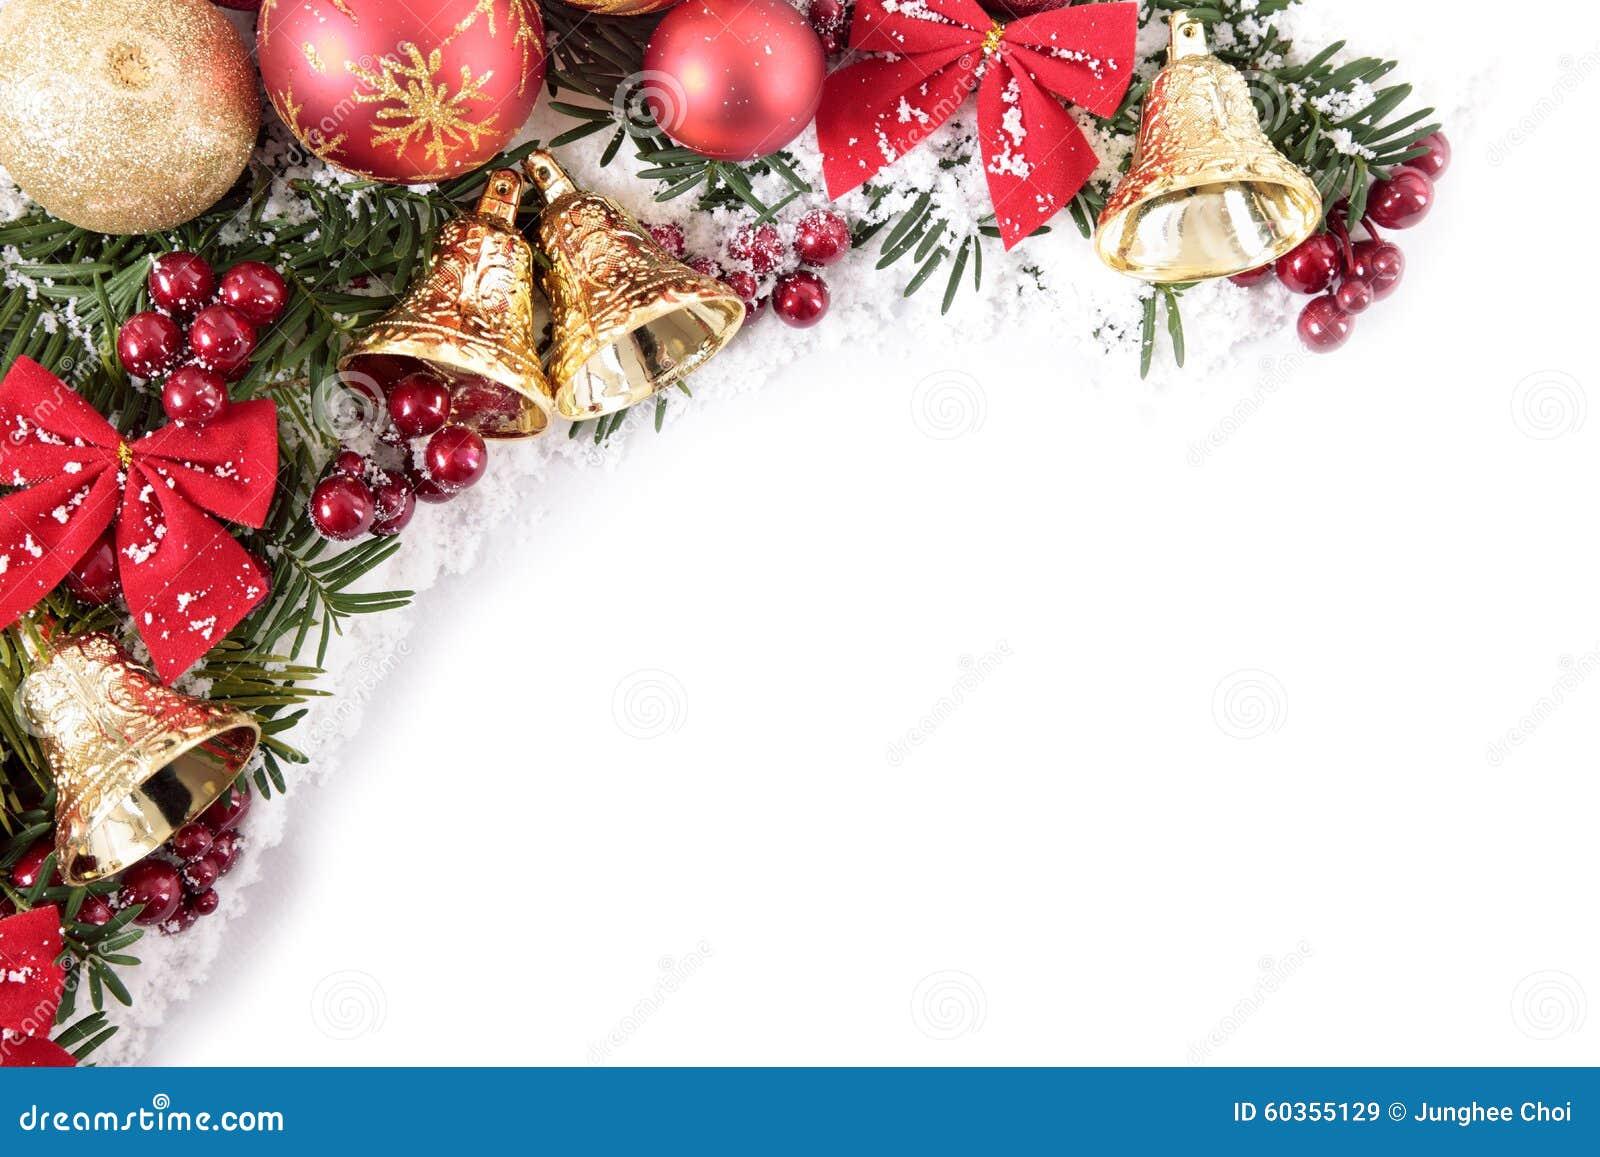 #AB202C Christmas Decorations Corner Border Frame With White Copy  6411 décoration noel fabriquer cm1 1300x957 px @ aertt.com